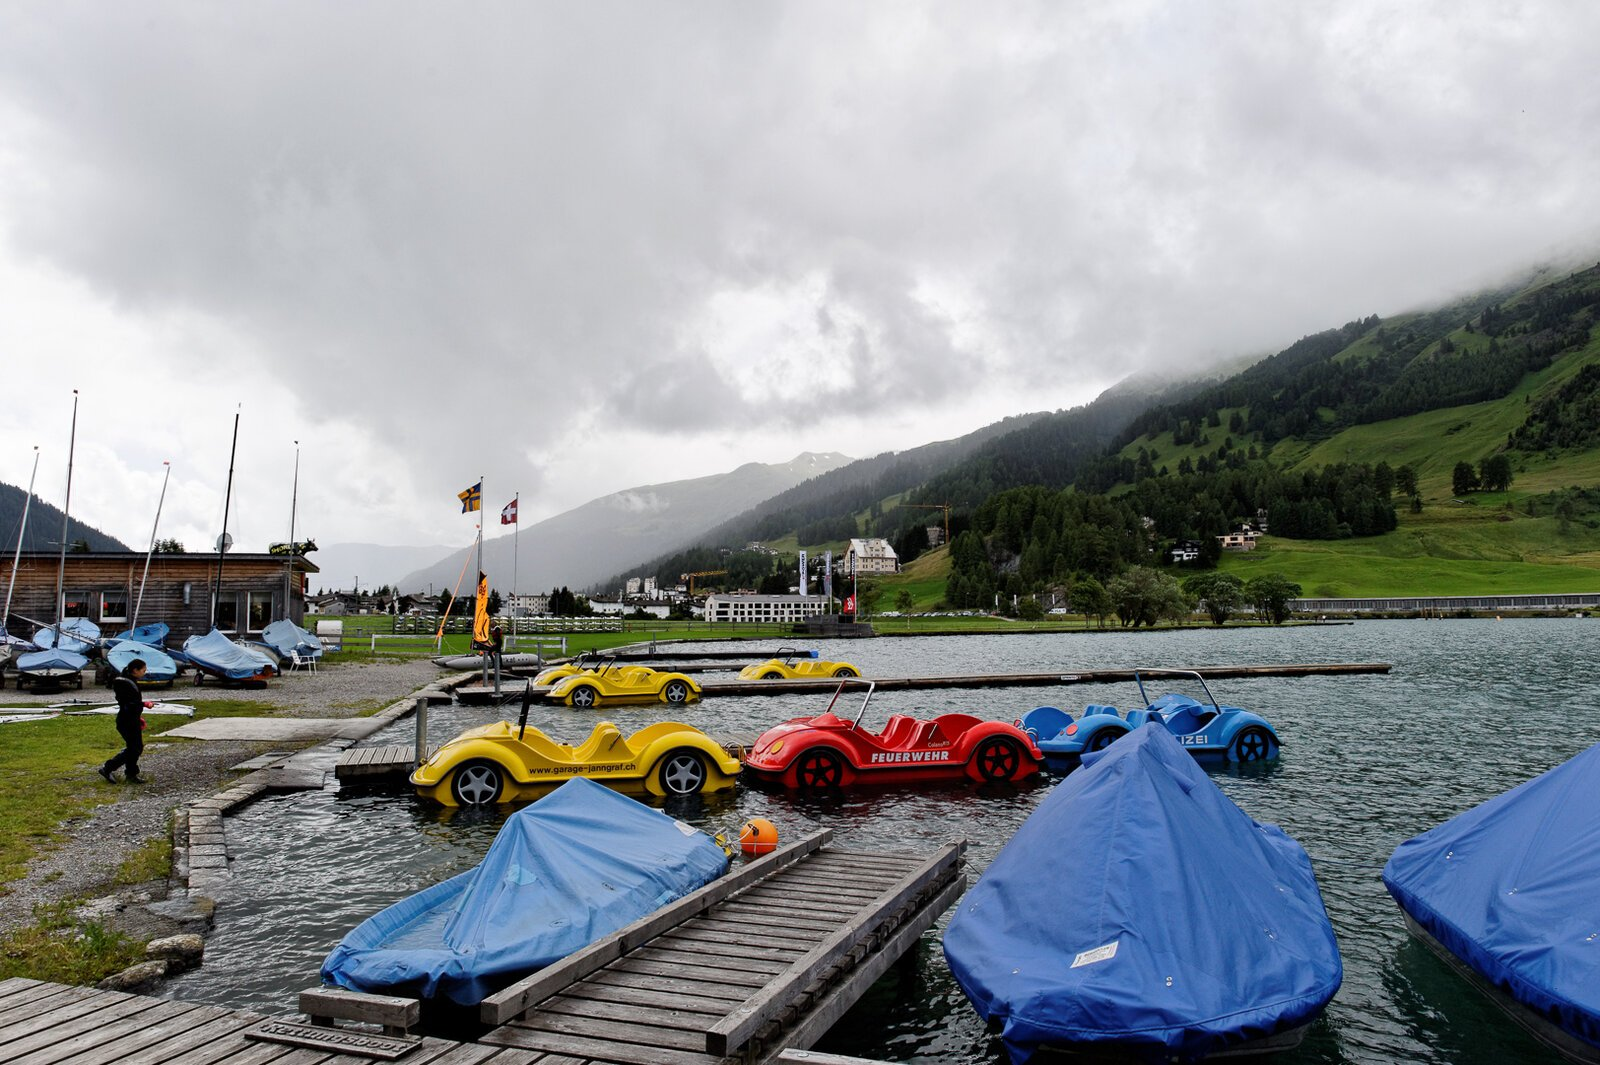 2012-Klosters_2012-07-15_14-03-52_00881_DxO.jpg